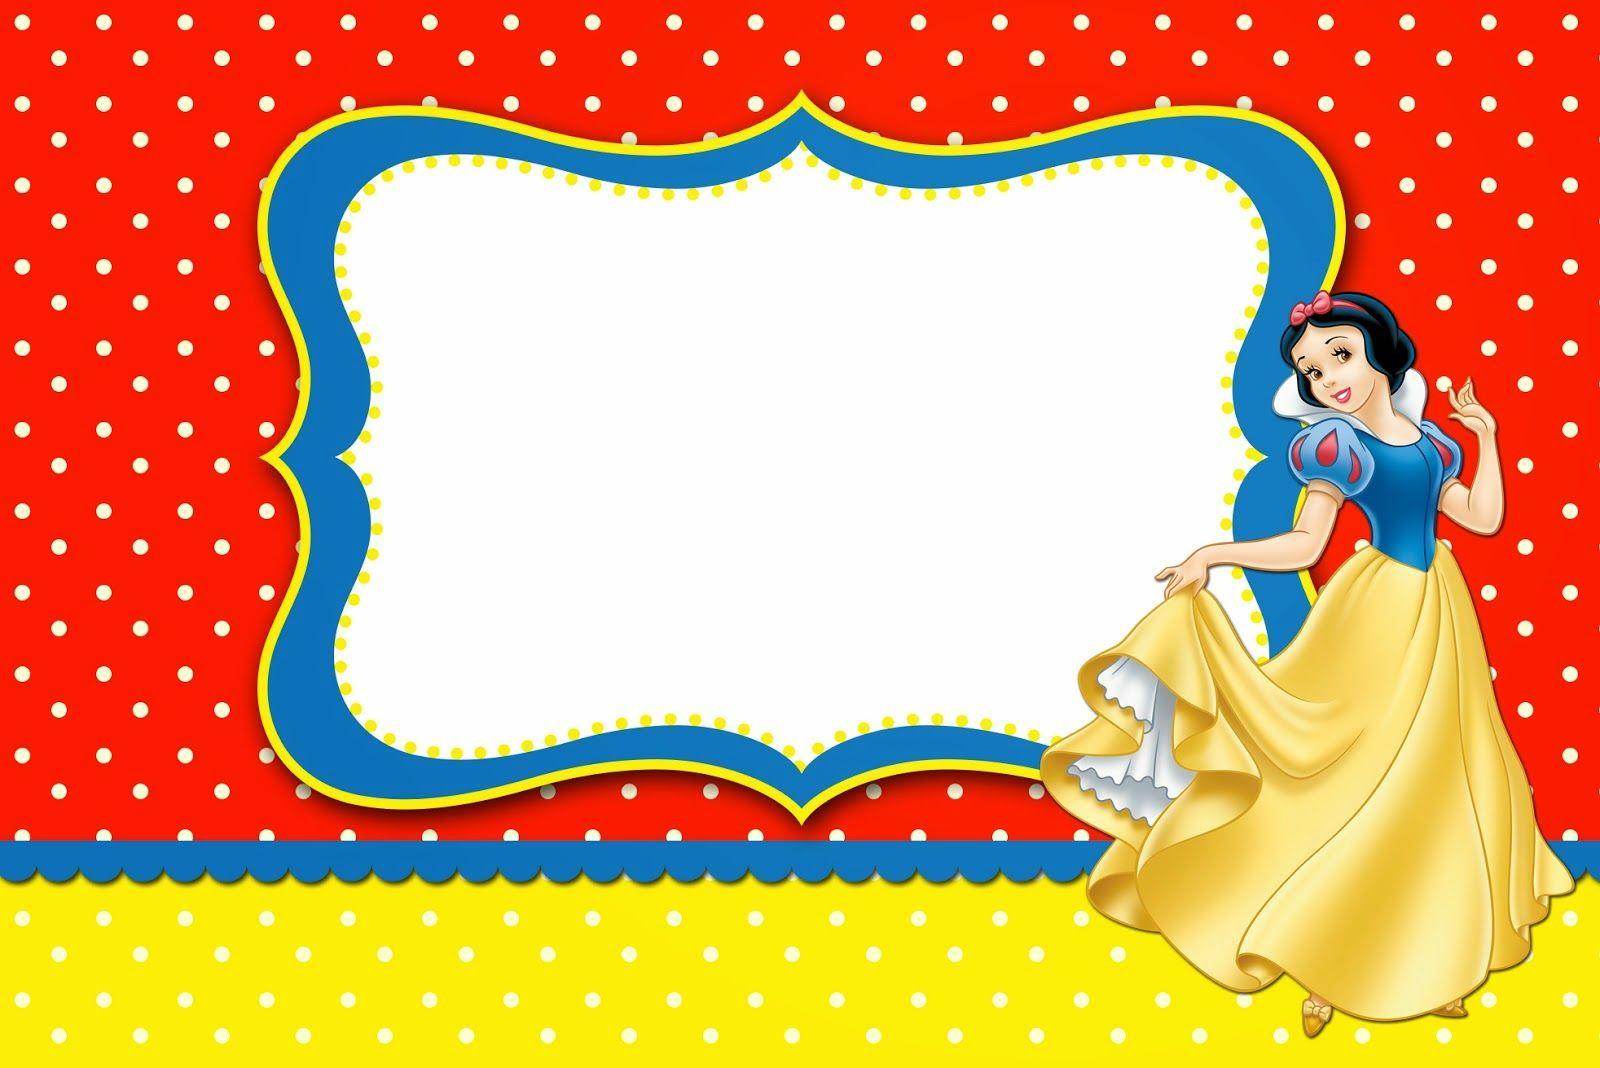 Snow White: Free Printable Invitations, Labels Or Cards. | Snow - Snow White Invitations Free Printable